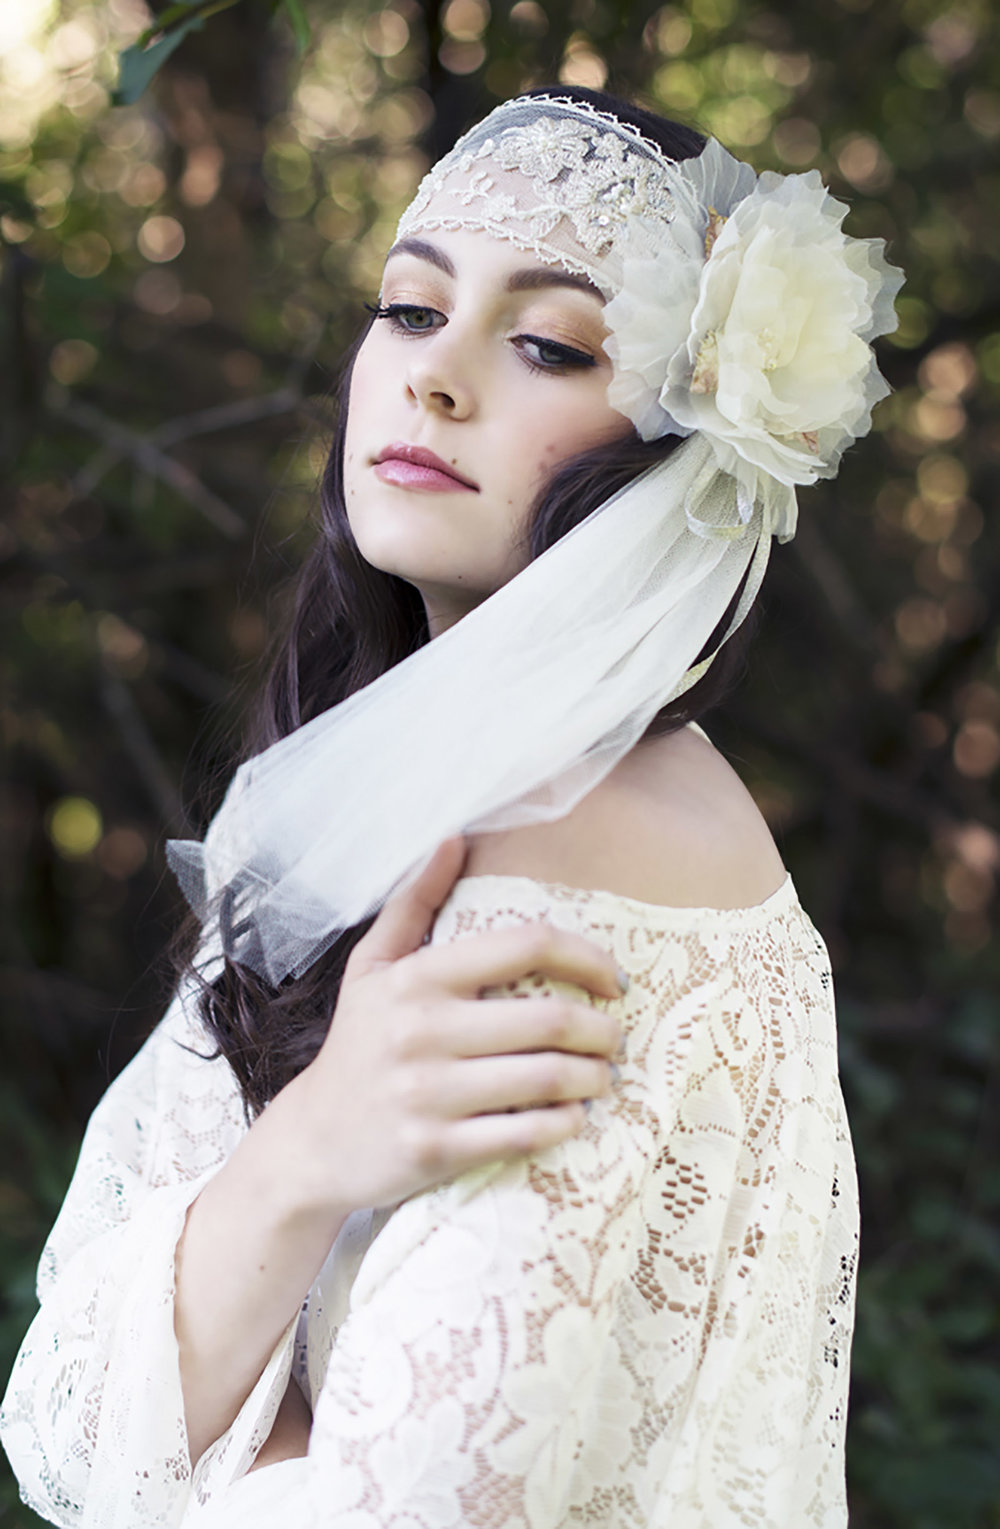 Whitney-Heard-Photography-Blair-Nadeau-Millinery-2015-Collection-00003.jpg